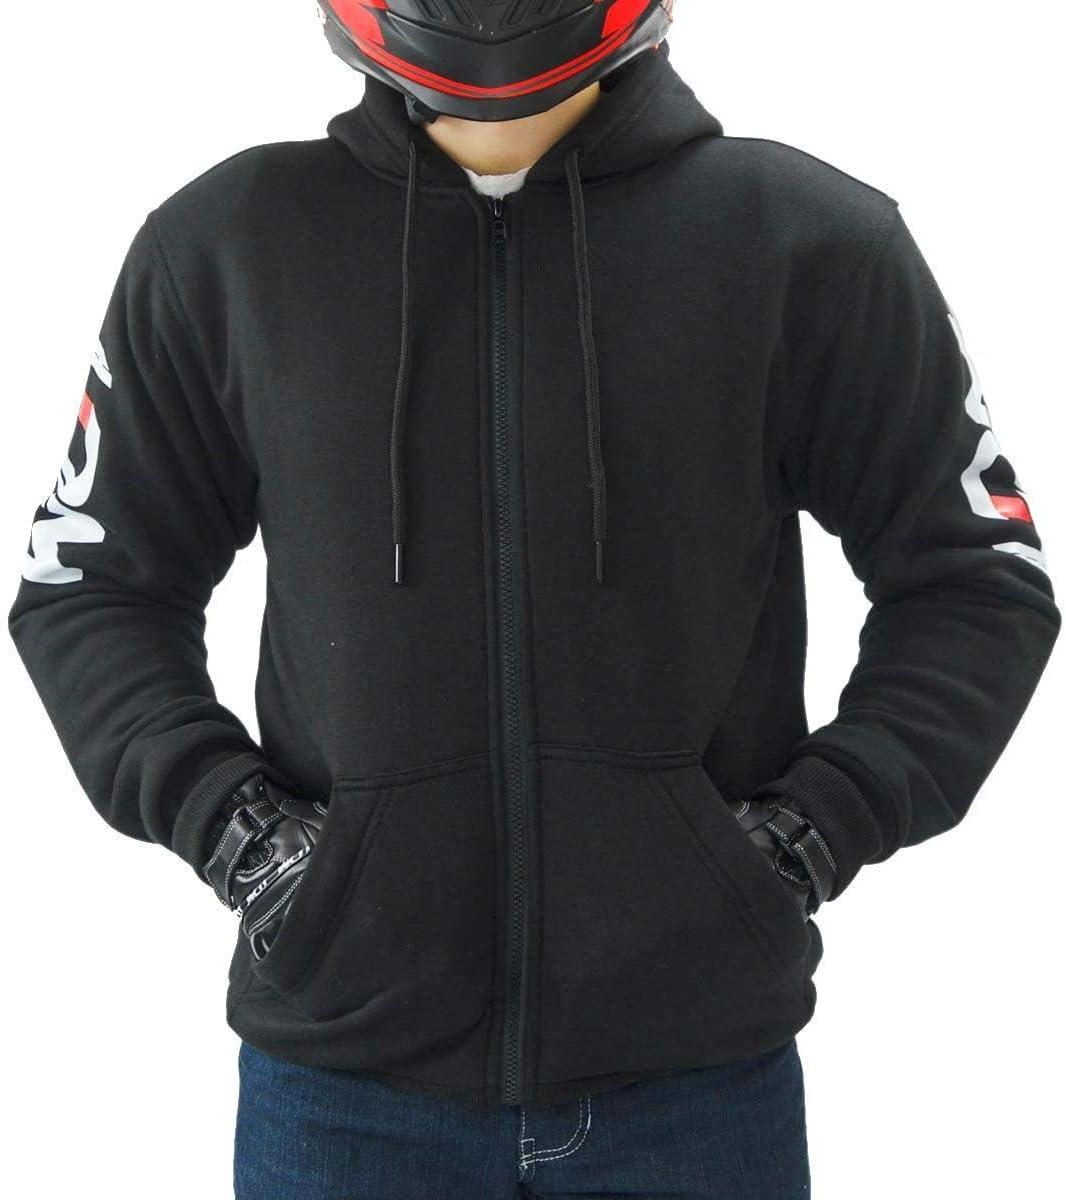 LDM - Sudadera con capucha para hombre, para motorista Street-r, acorazada negro negro XL (43.5-44.5 inches)